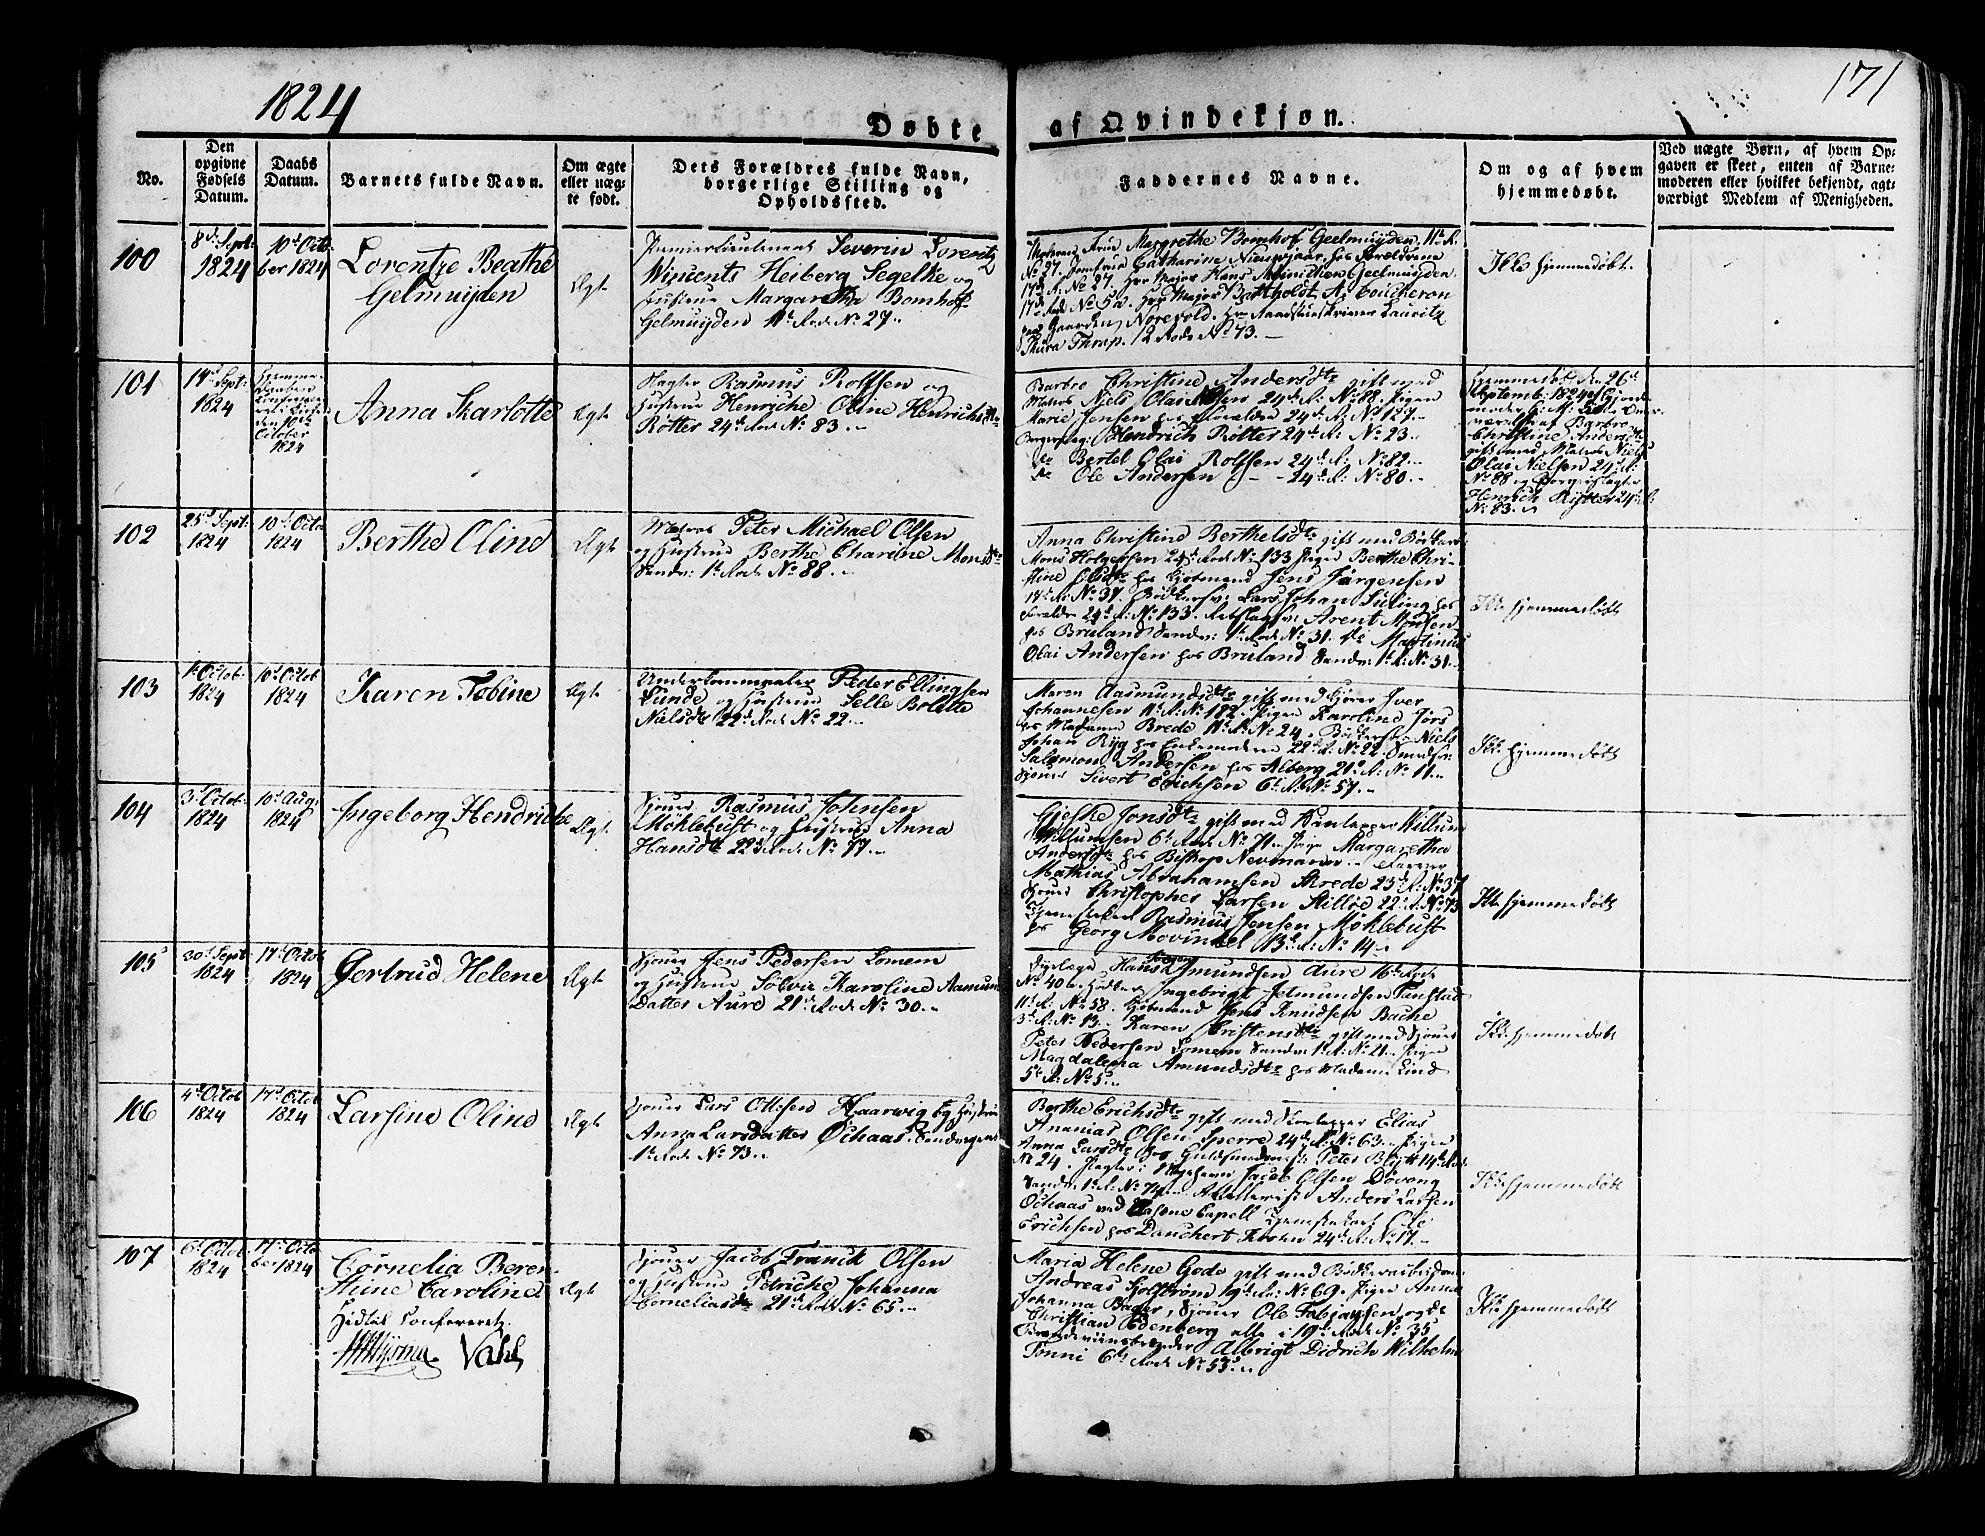 SAB, Korskirken Sokneprestembete, H/Haa/L0014: Ministerialbok nr. A 14, 1823-1835, s. 171